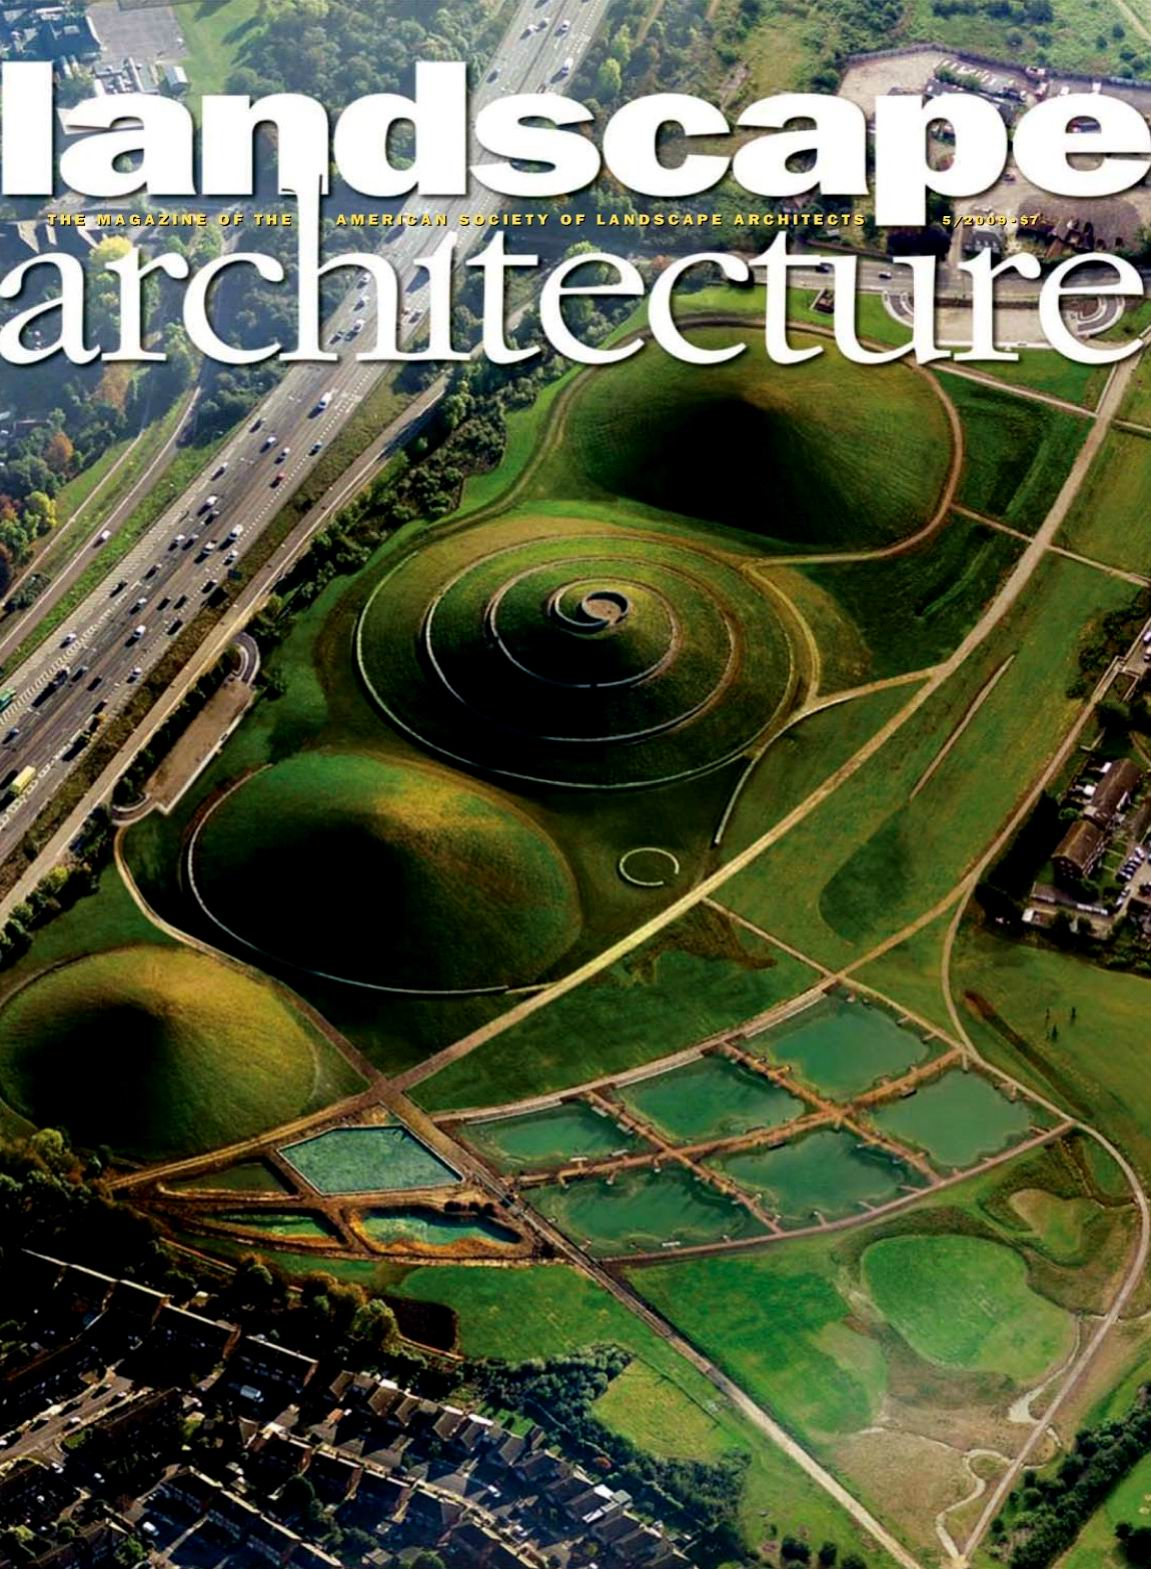 Download Landscape Architecture May 2009 5 Pdf Magazine